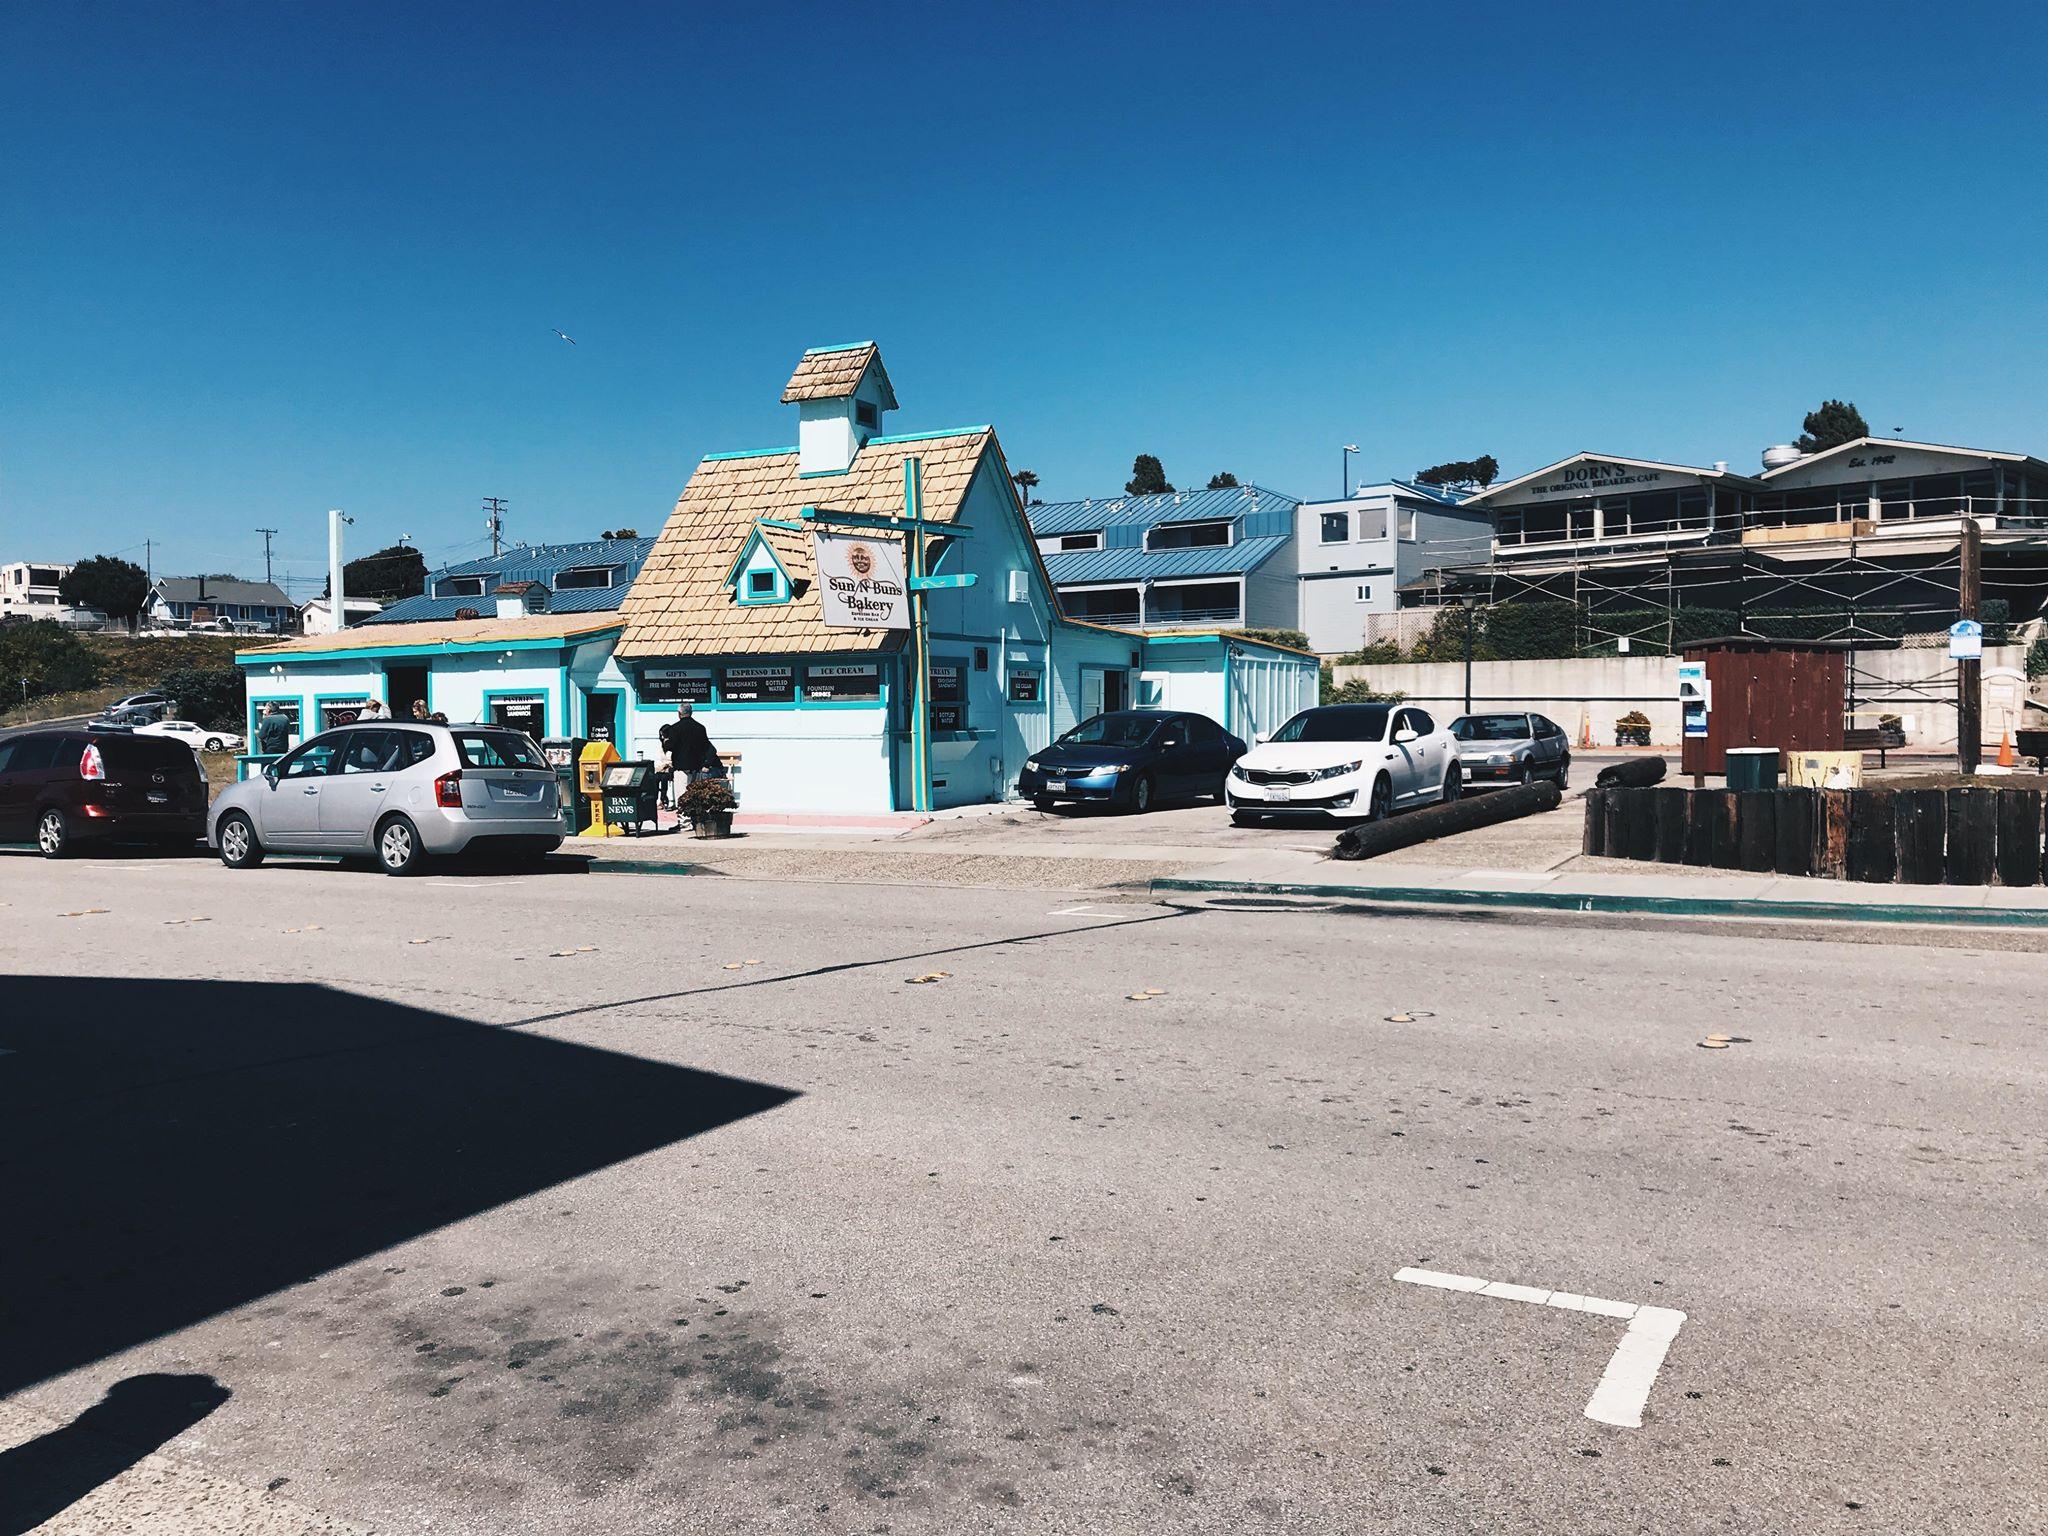 morrobaycaliforniastreets.jpg